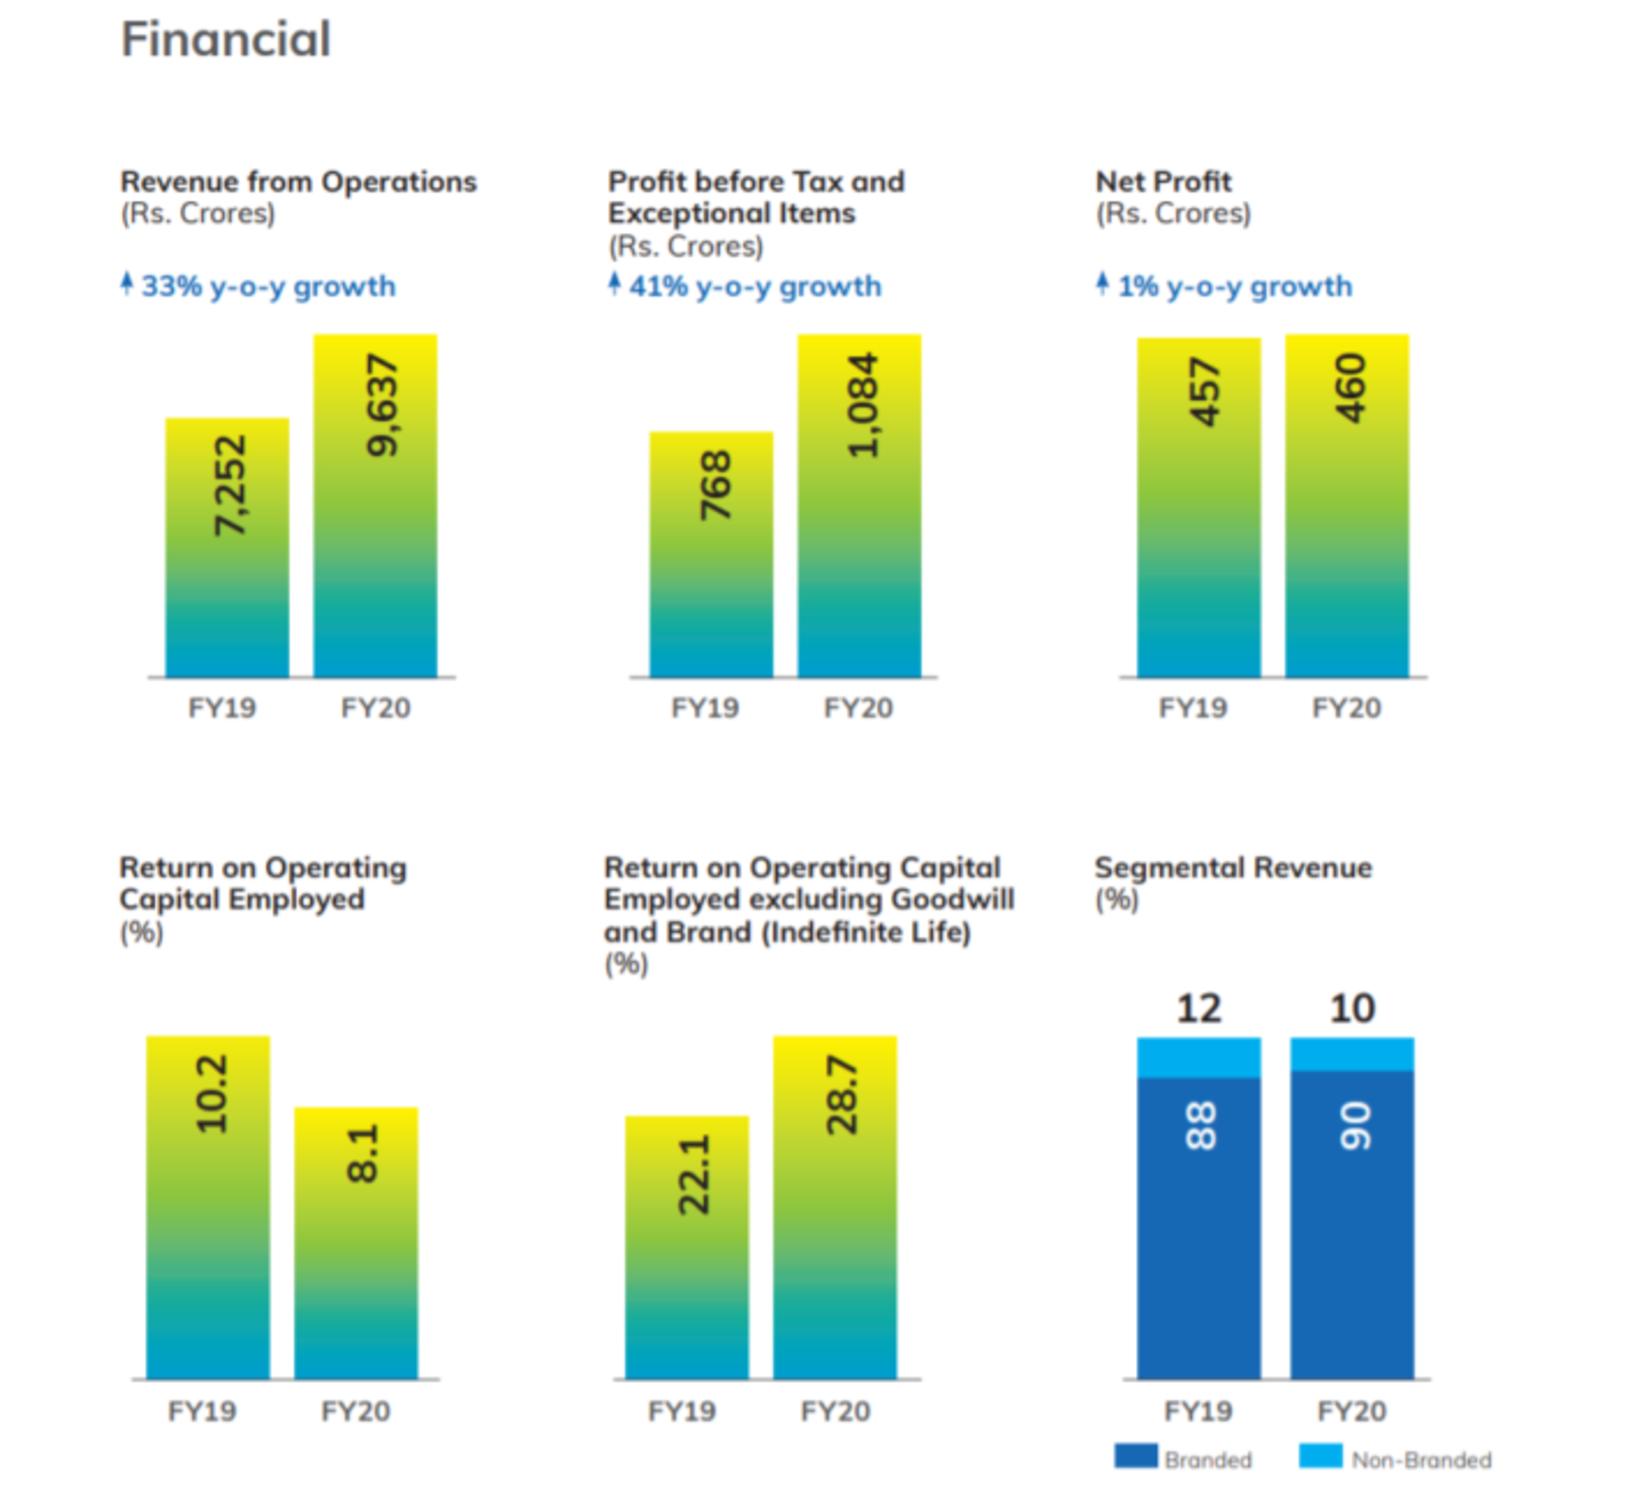 Financials of tata Consumer Products